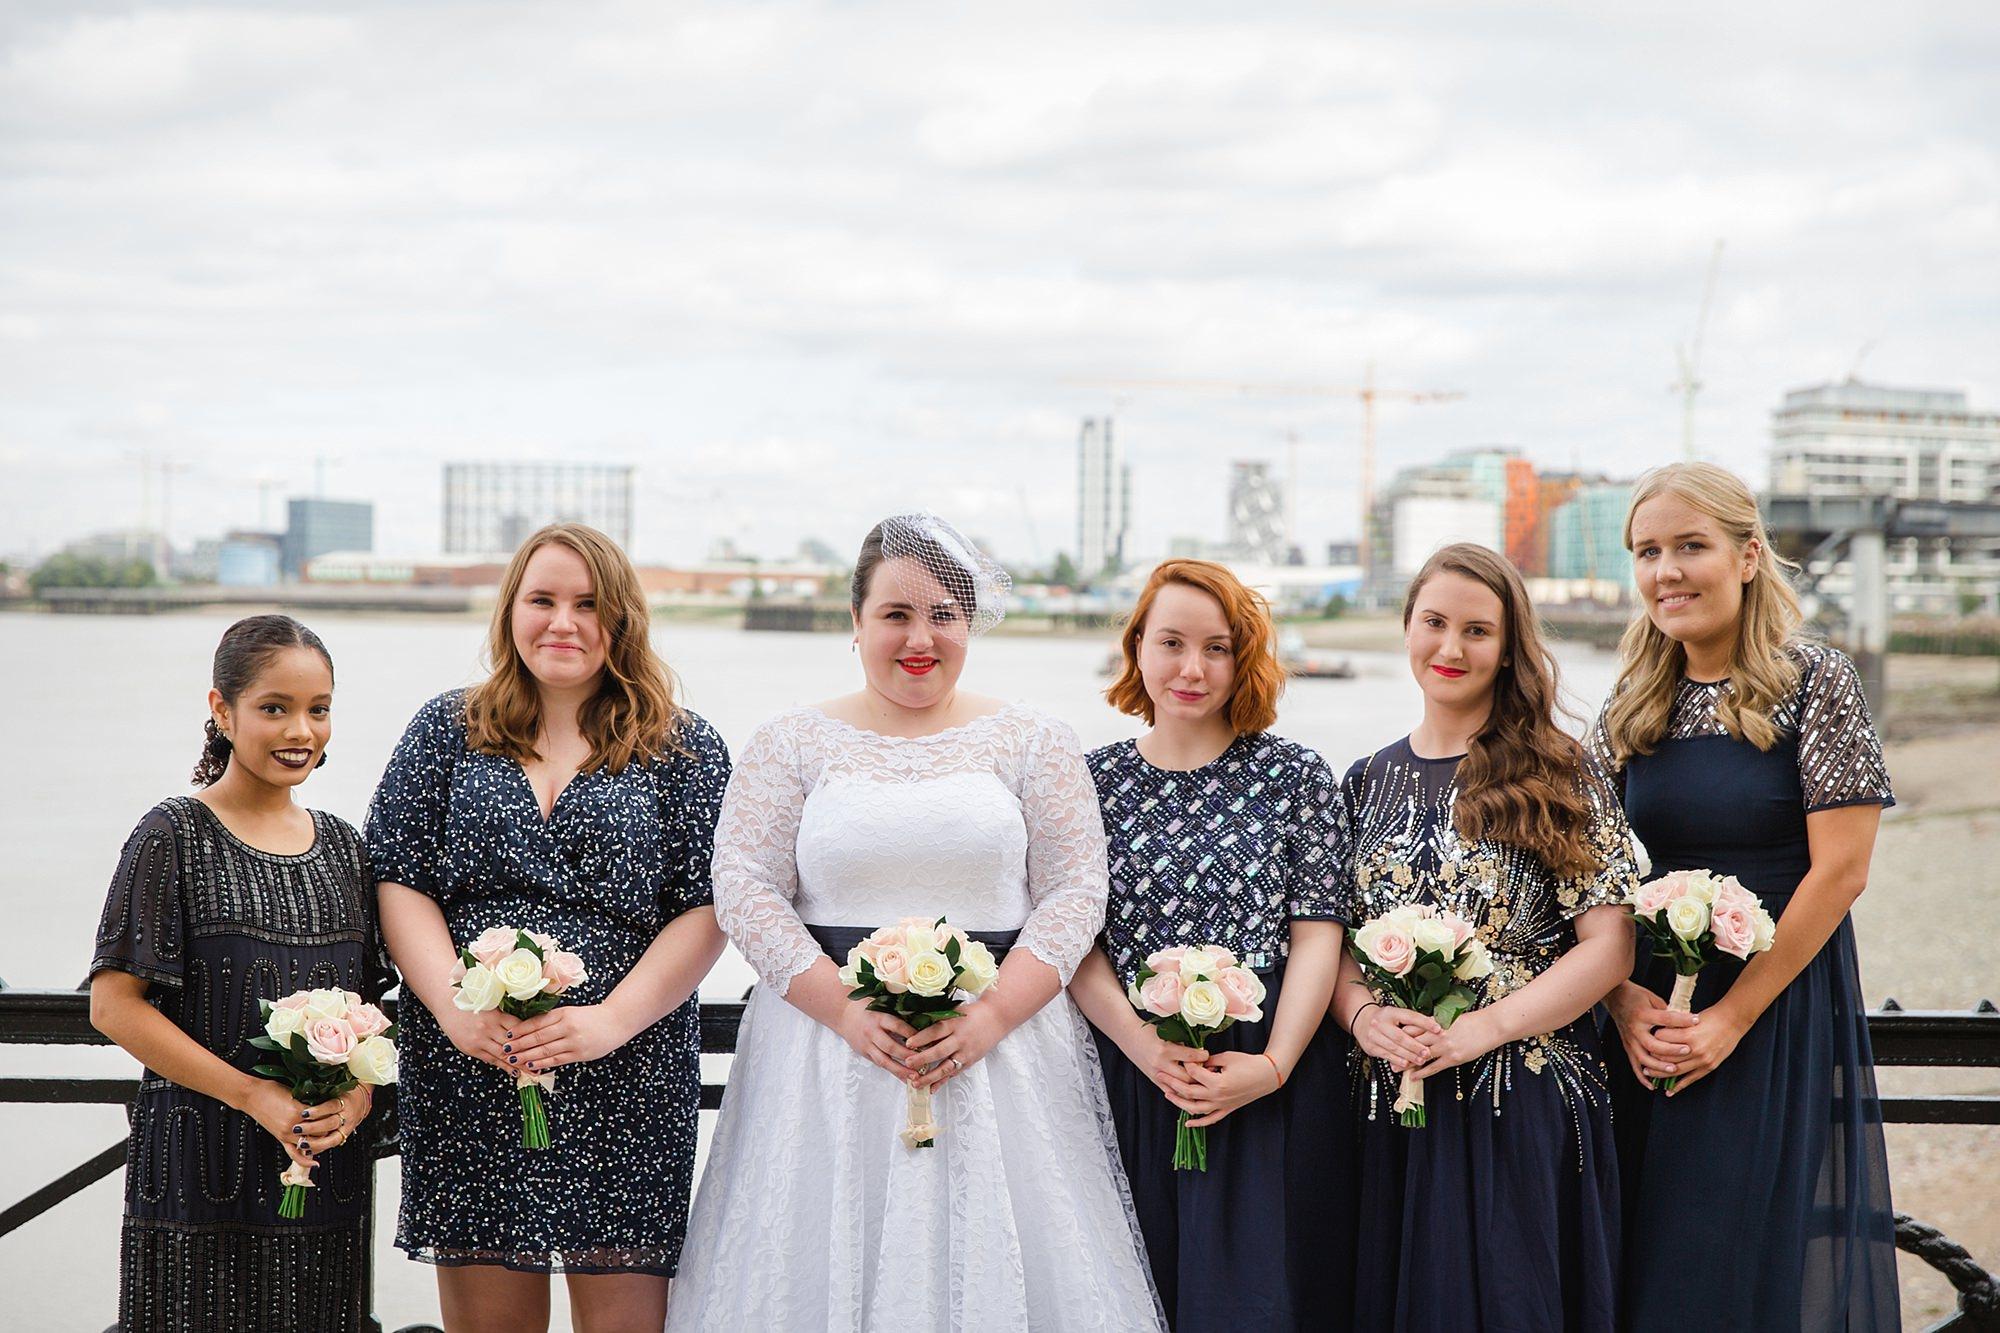 Trafalgar Tavern wedding portrait of bride and bridesmaids